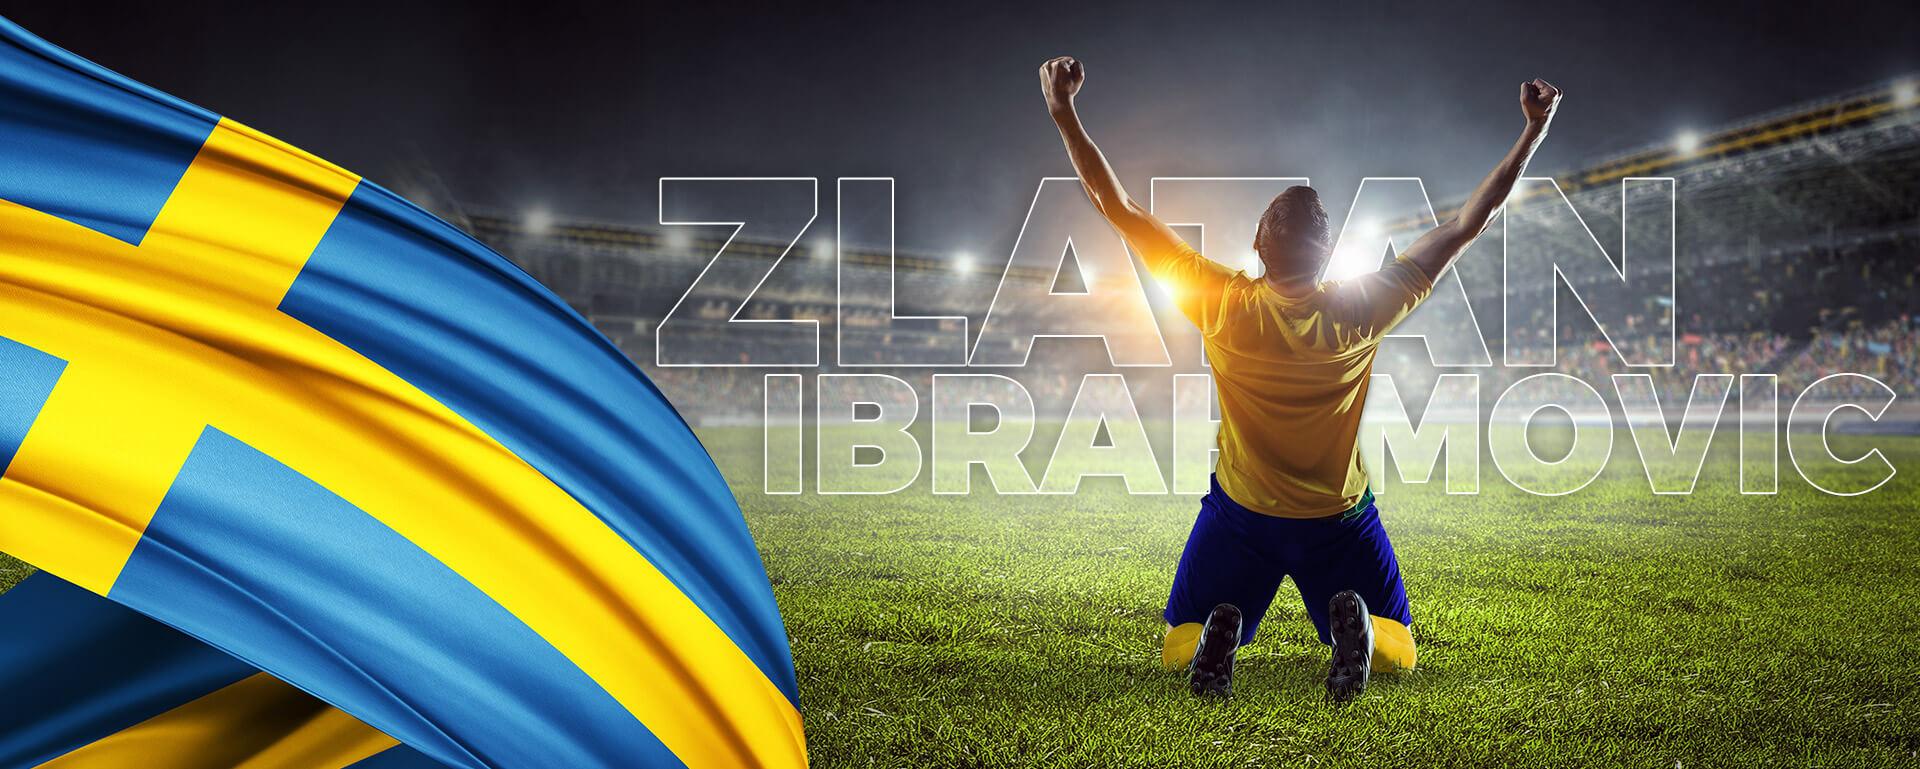 ZLATAN IBRAHIMOVIC: EURO 2020 (2021) SPECIAL BETTING PREVIEW